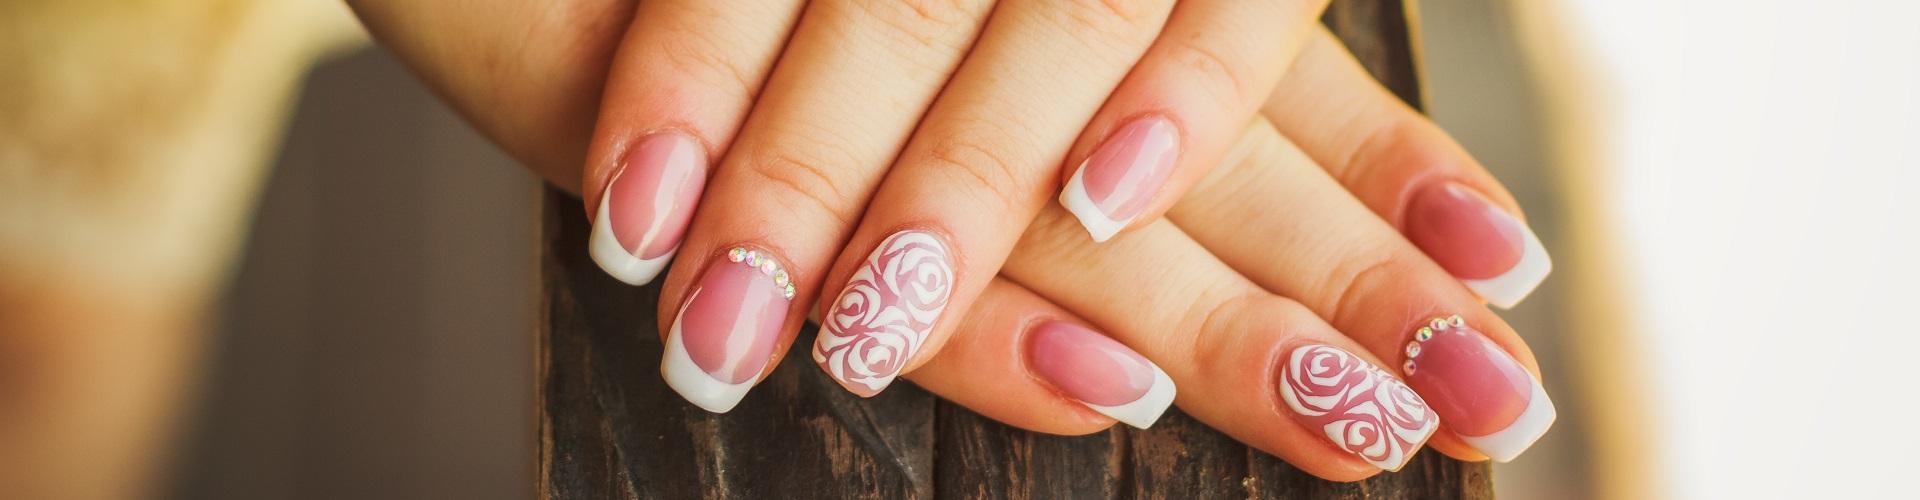 corso di nail art